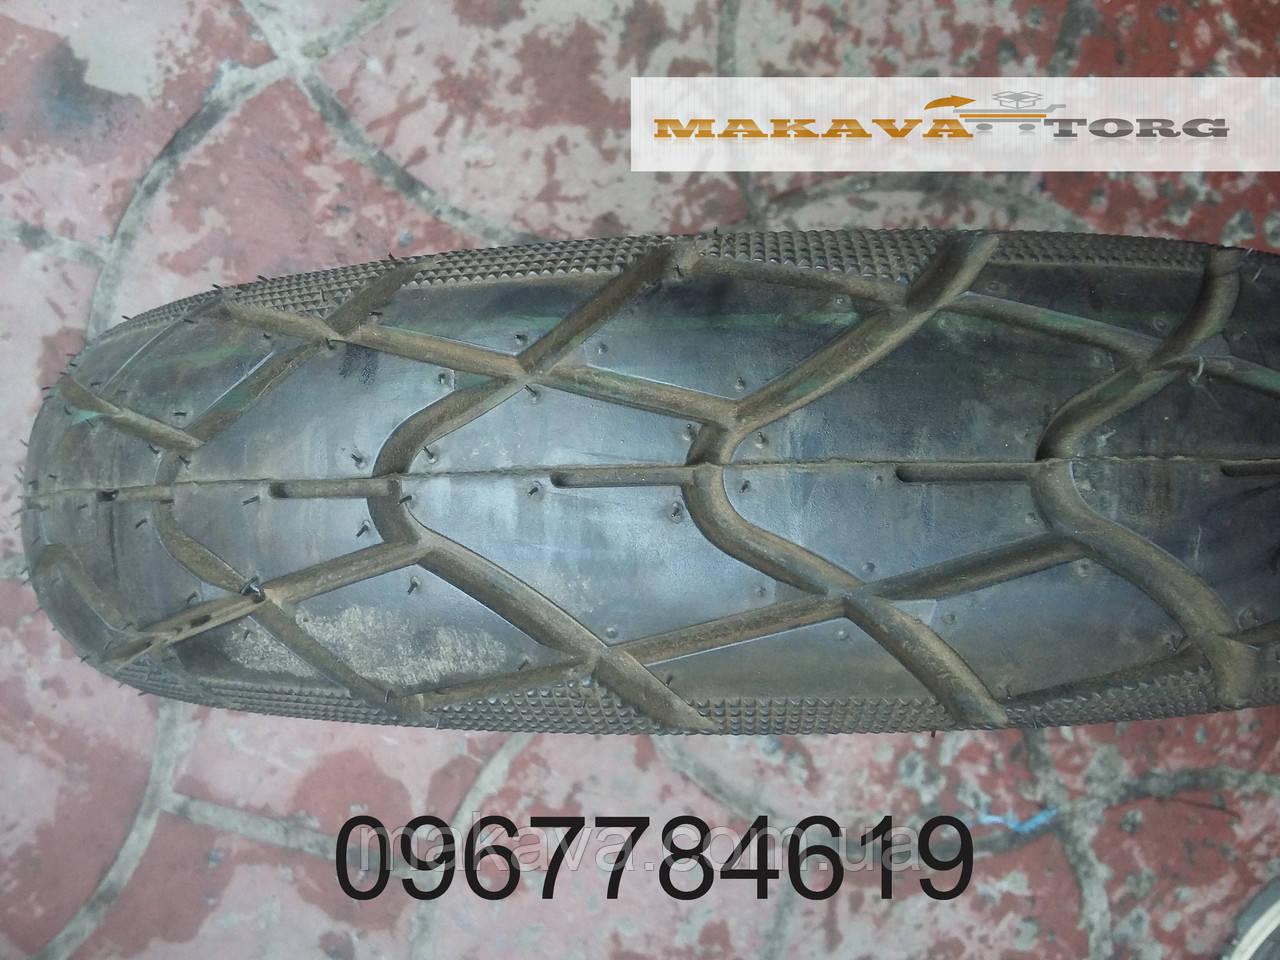 Мотоциклетные покрышки 3.5-10 NAIDUN N-308 (Китай)